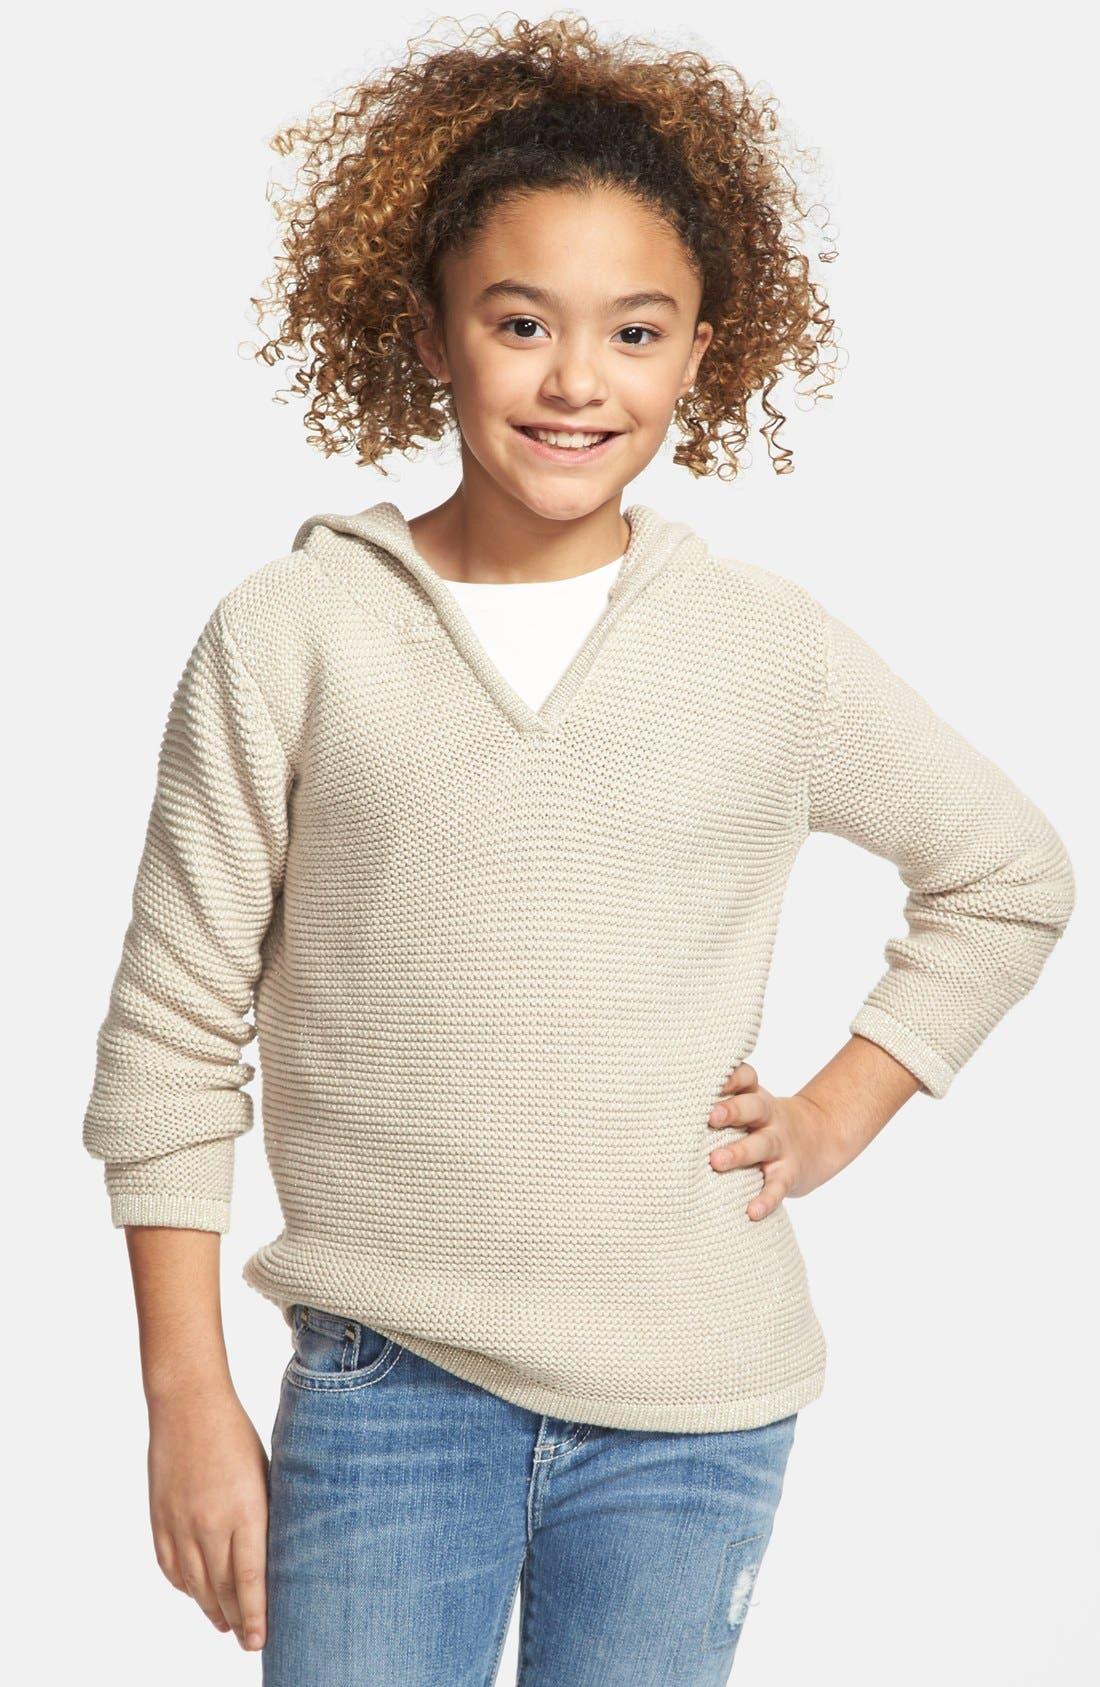 Alternate Image 2  - Peek 'Becca' Hooded Sweater (Toddler Girls, Little Girls & Big Girls)